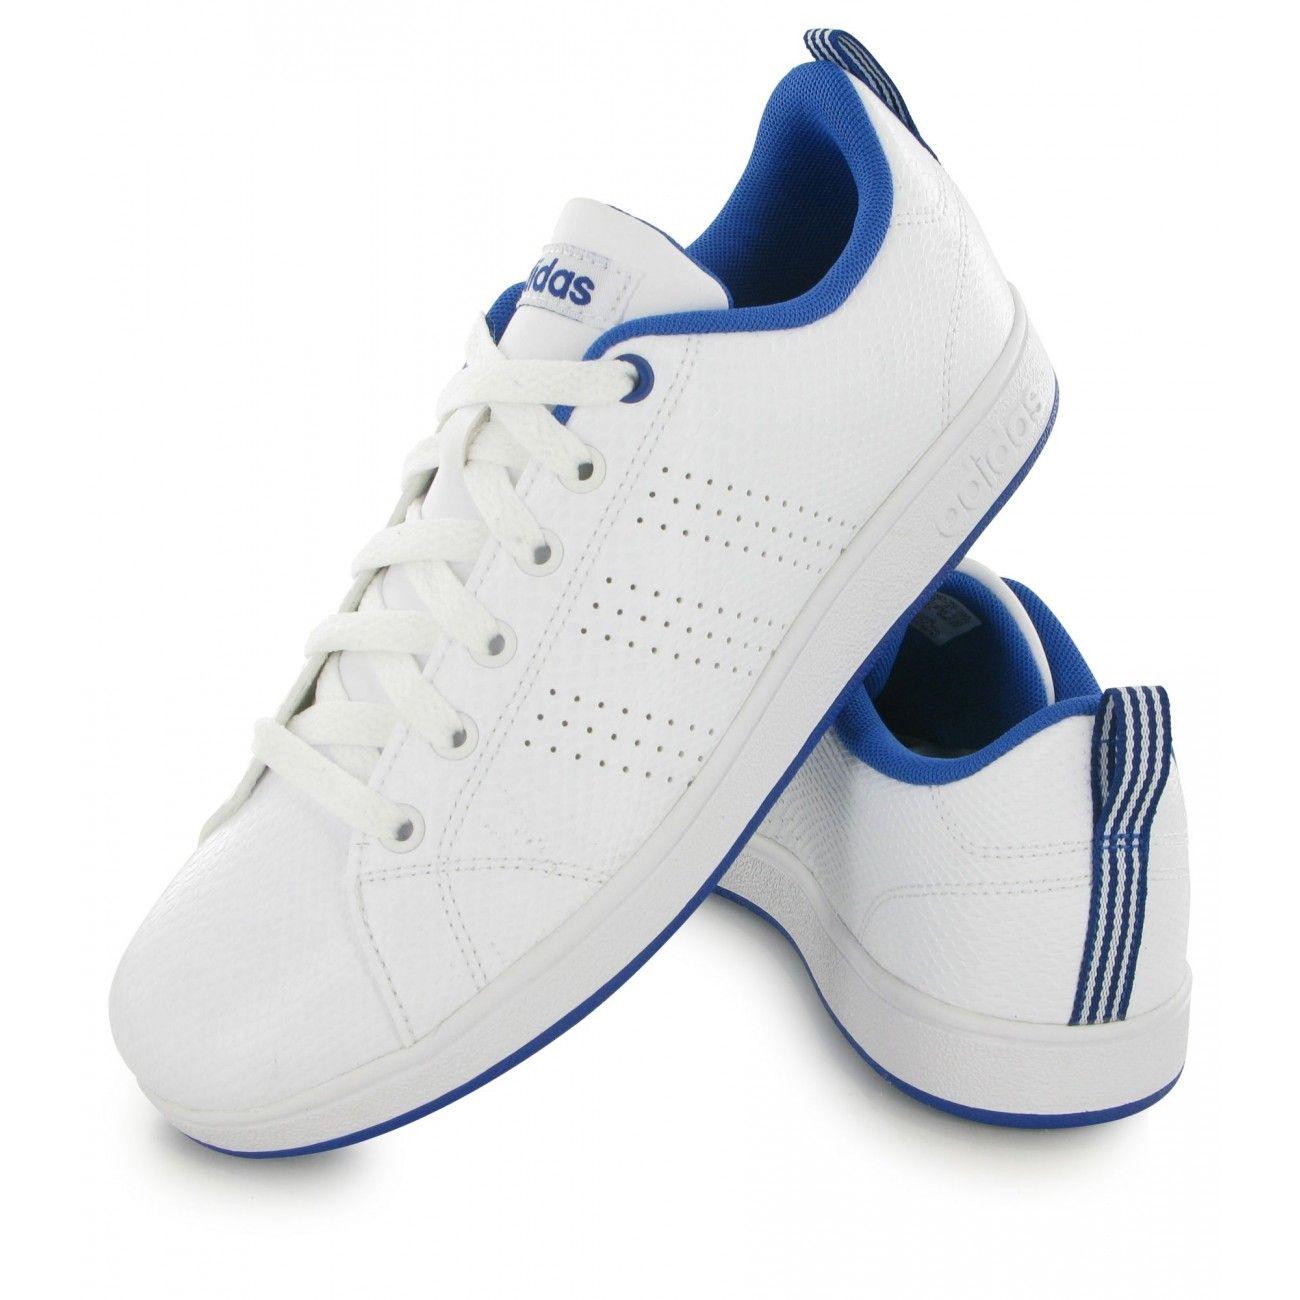 Mode- Lifestyle enfant ADIDAS NEO Adidas Neo Advantage Vs blanc ... 943af13520d65